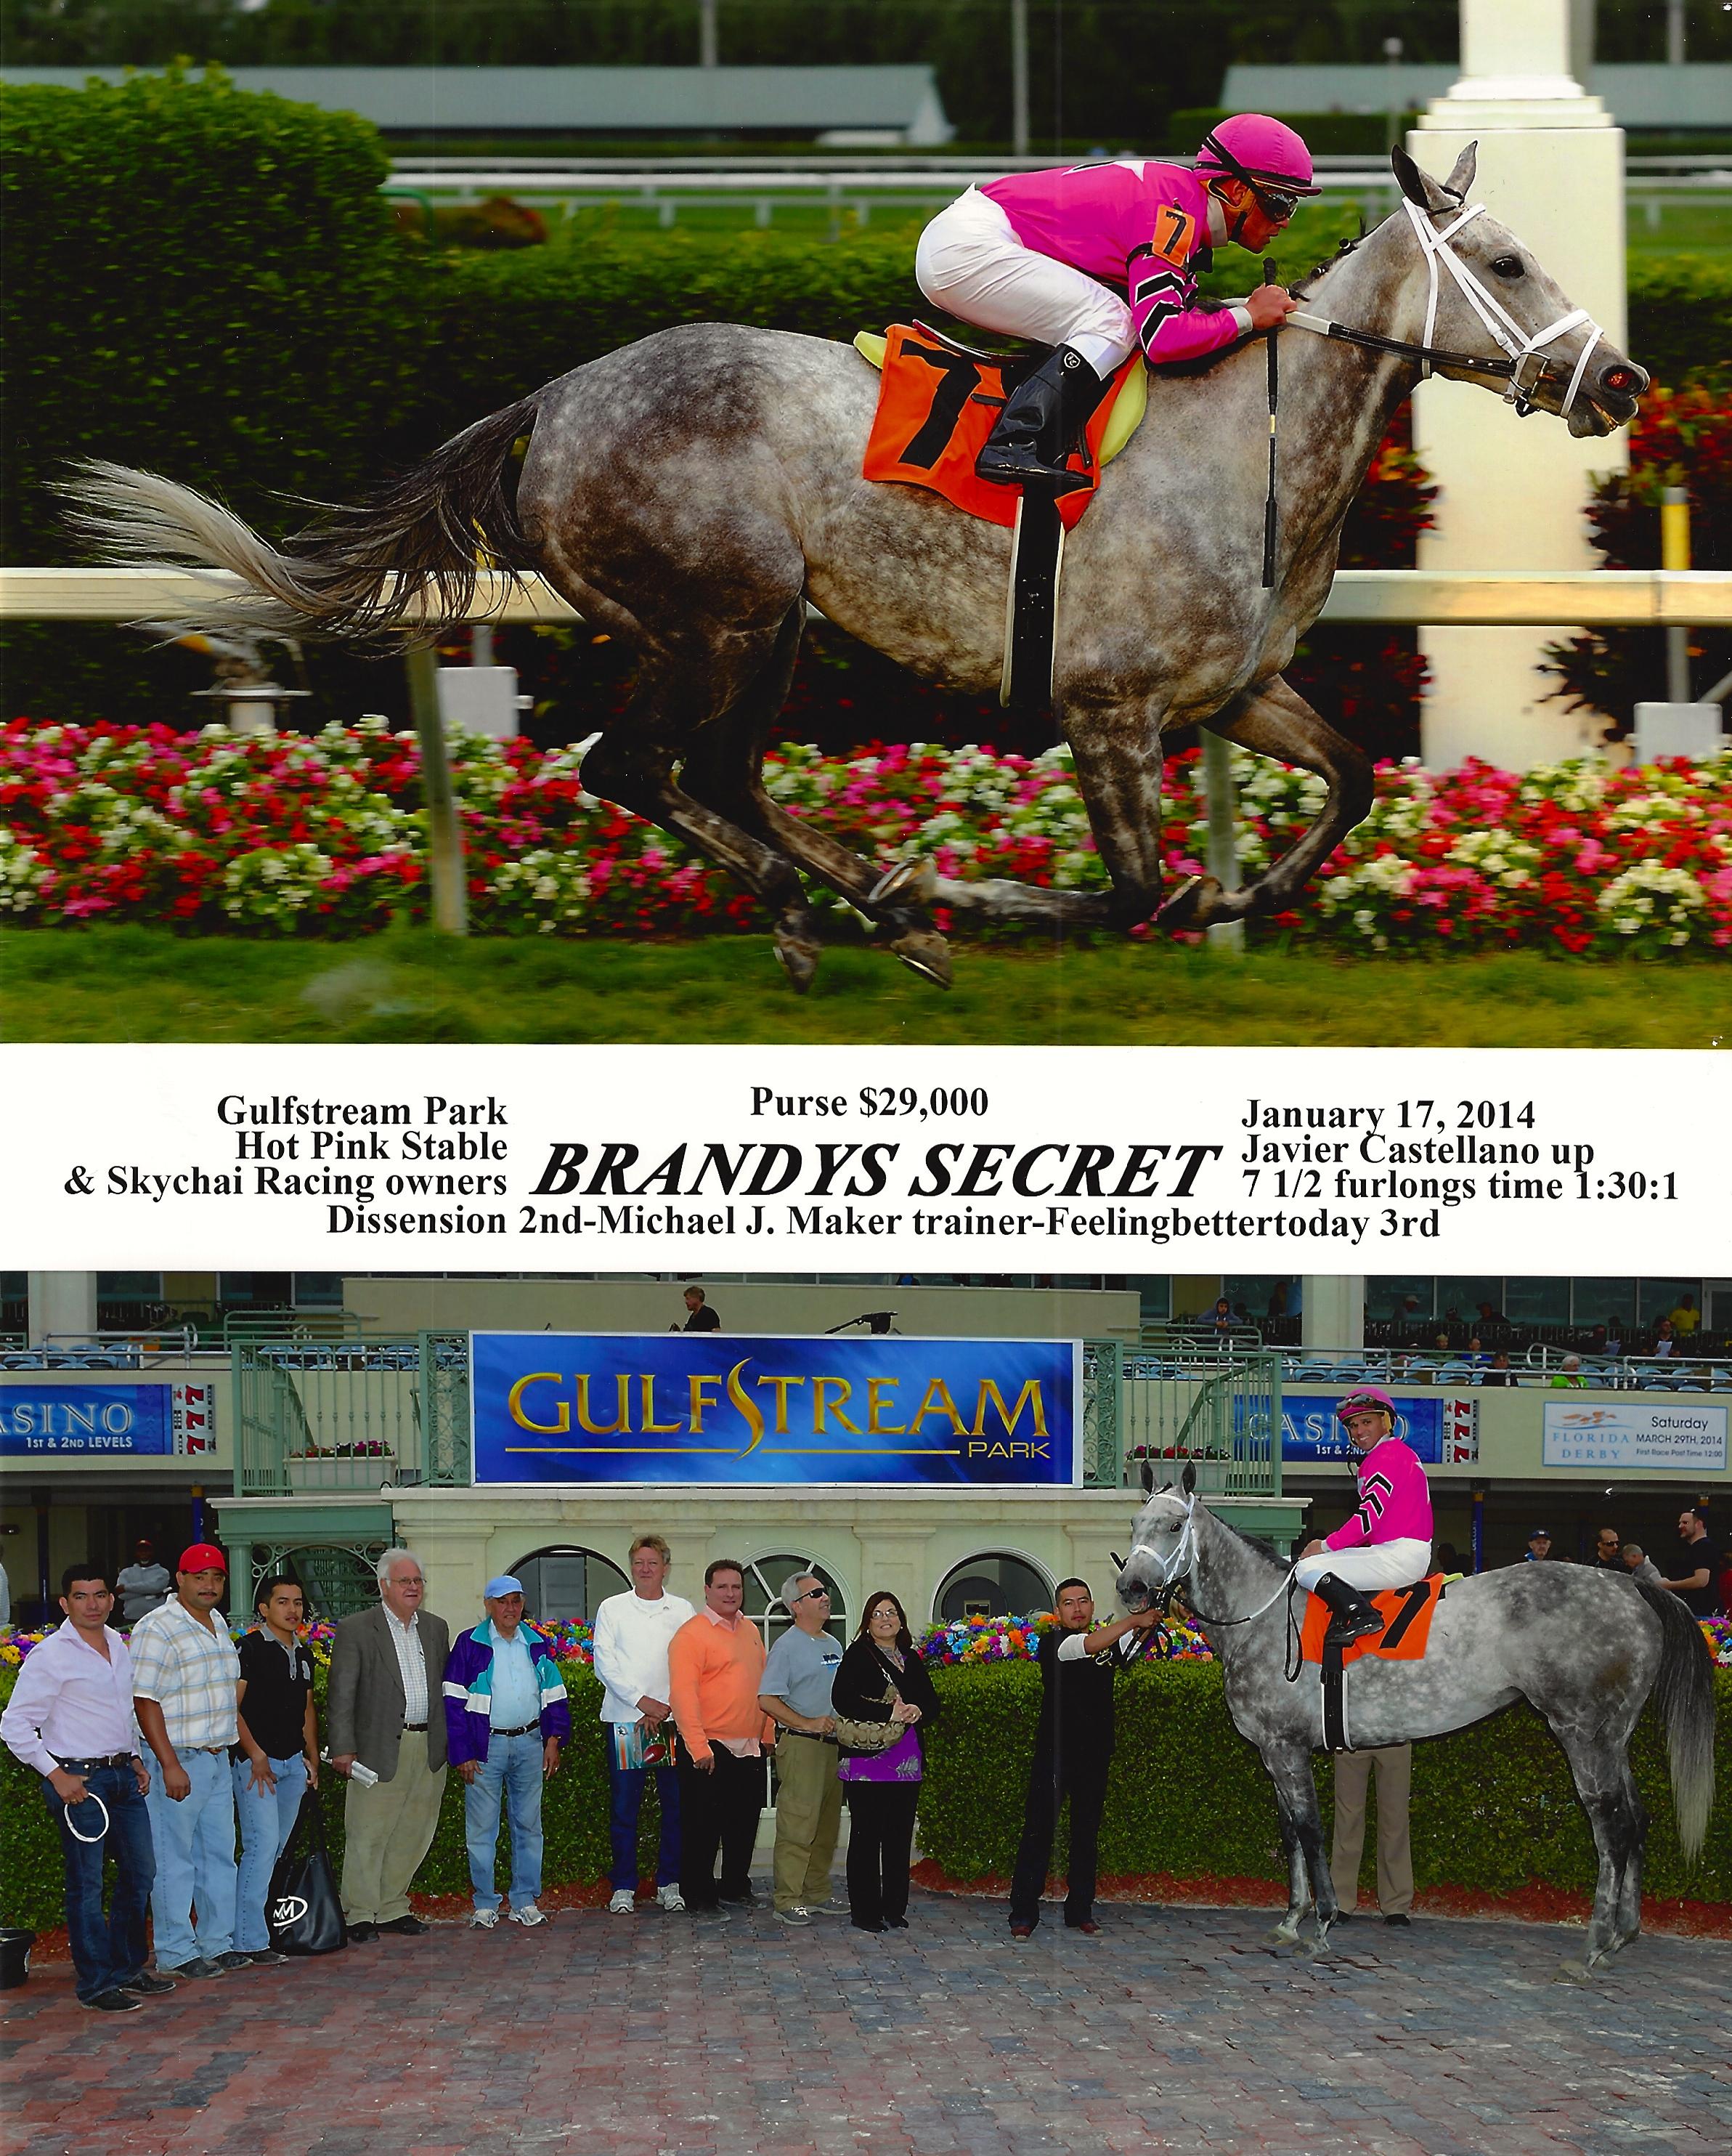 Brandys Secret